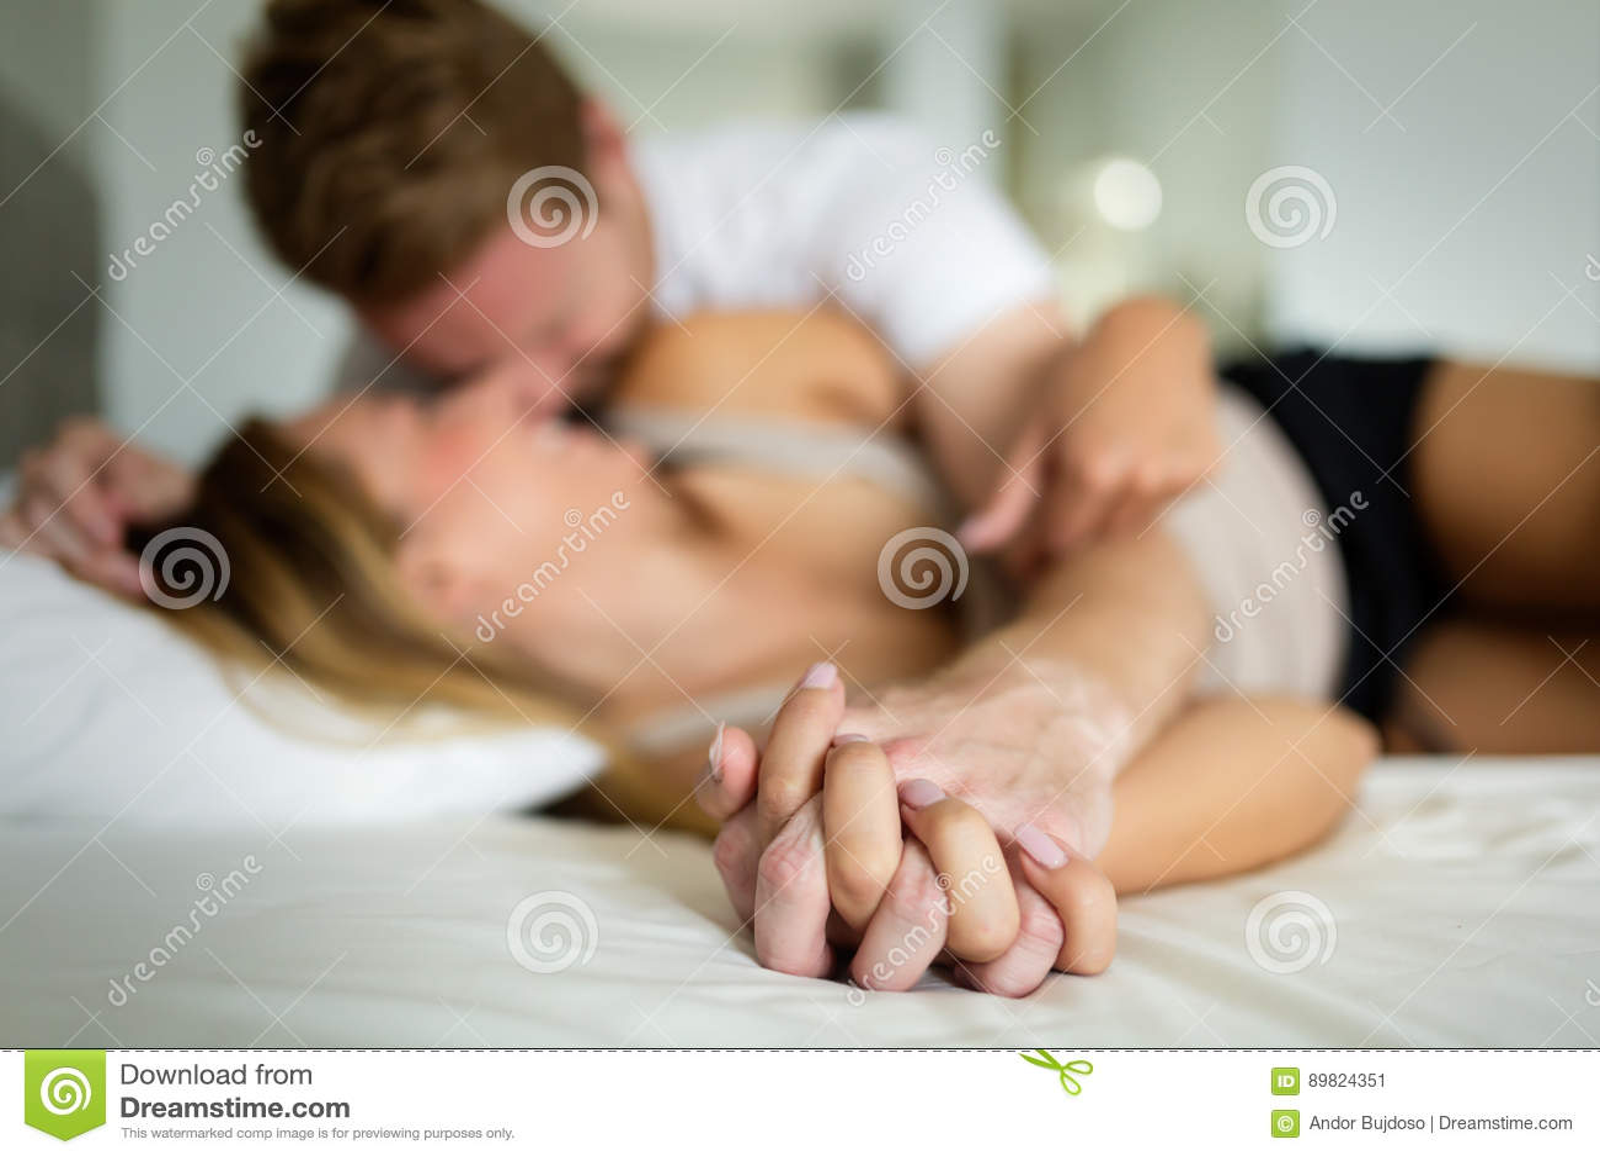 ANNMARIE: Femdom birthday spanking